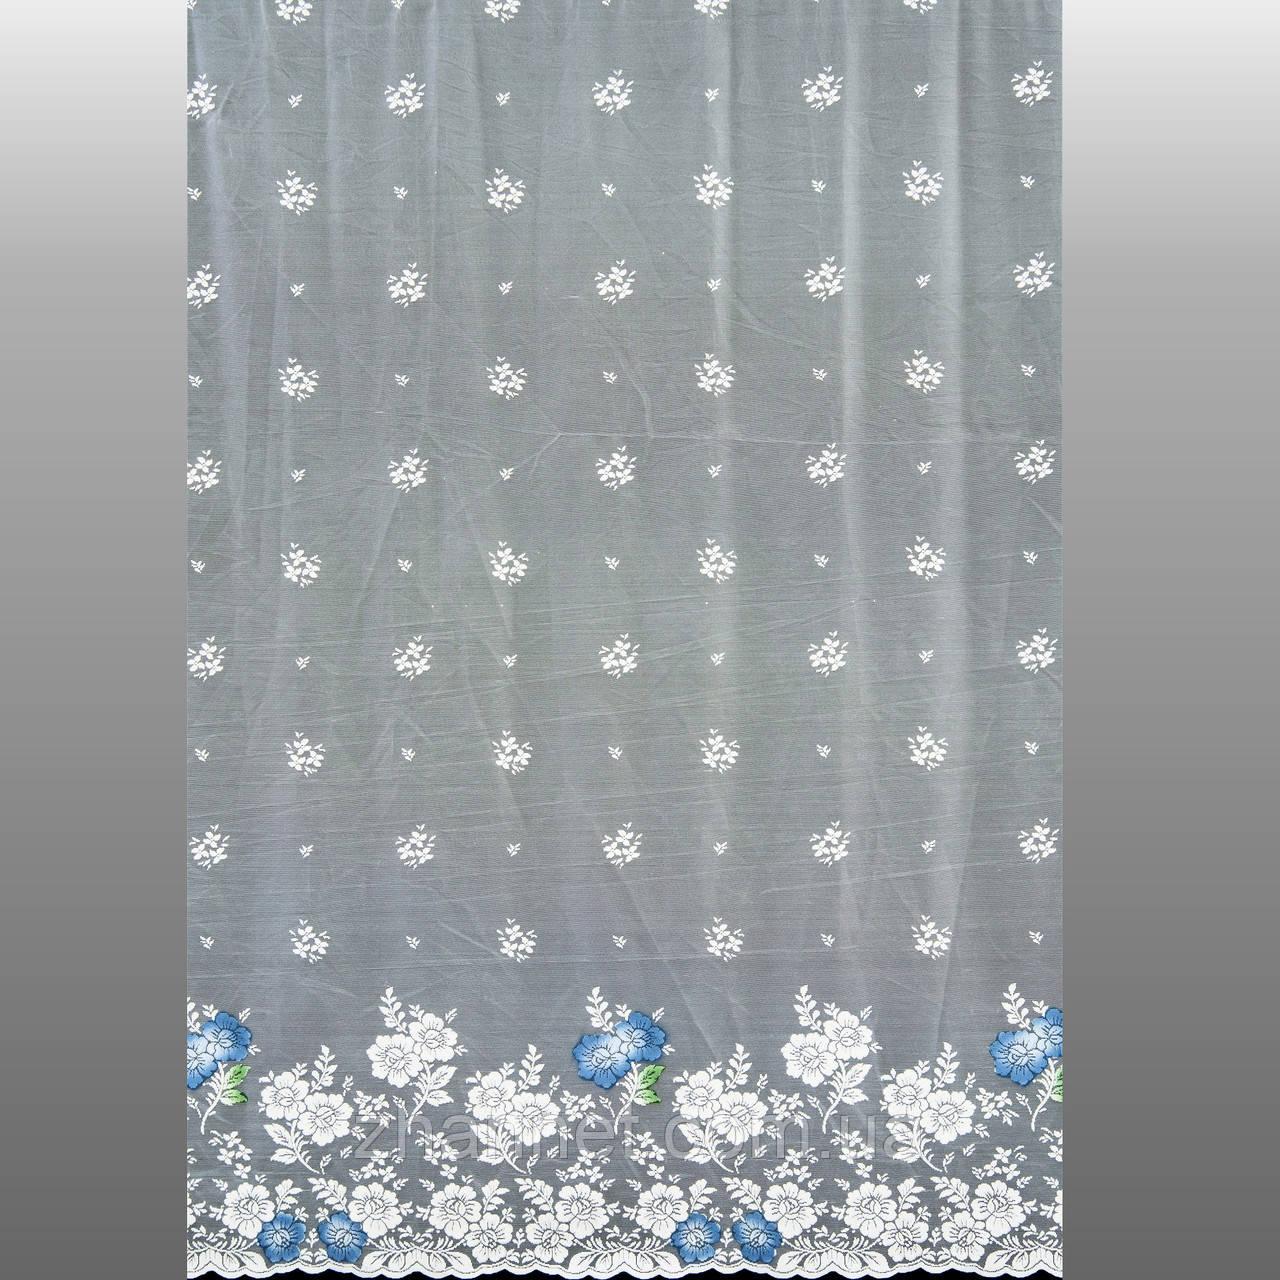 Тюль гипюр Ромашки голубой 180 см (362411)